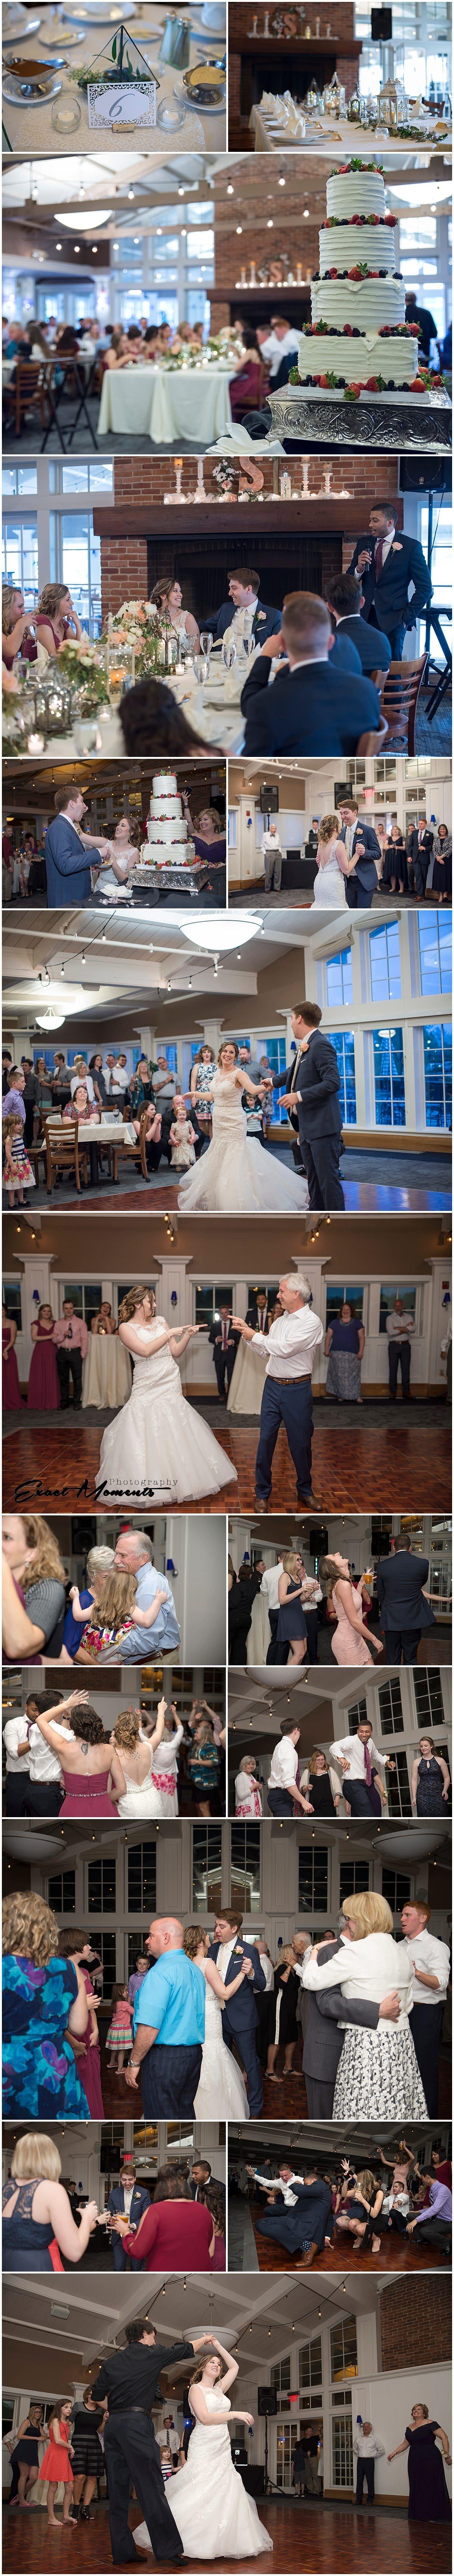 Nationwide Hotel Wedding Reception Lewis Center Ohio